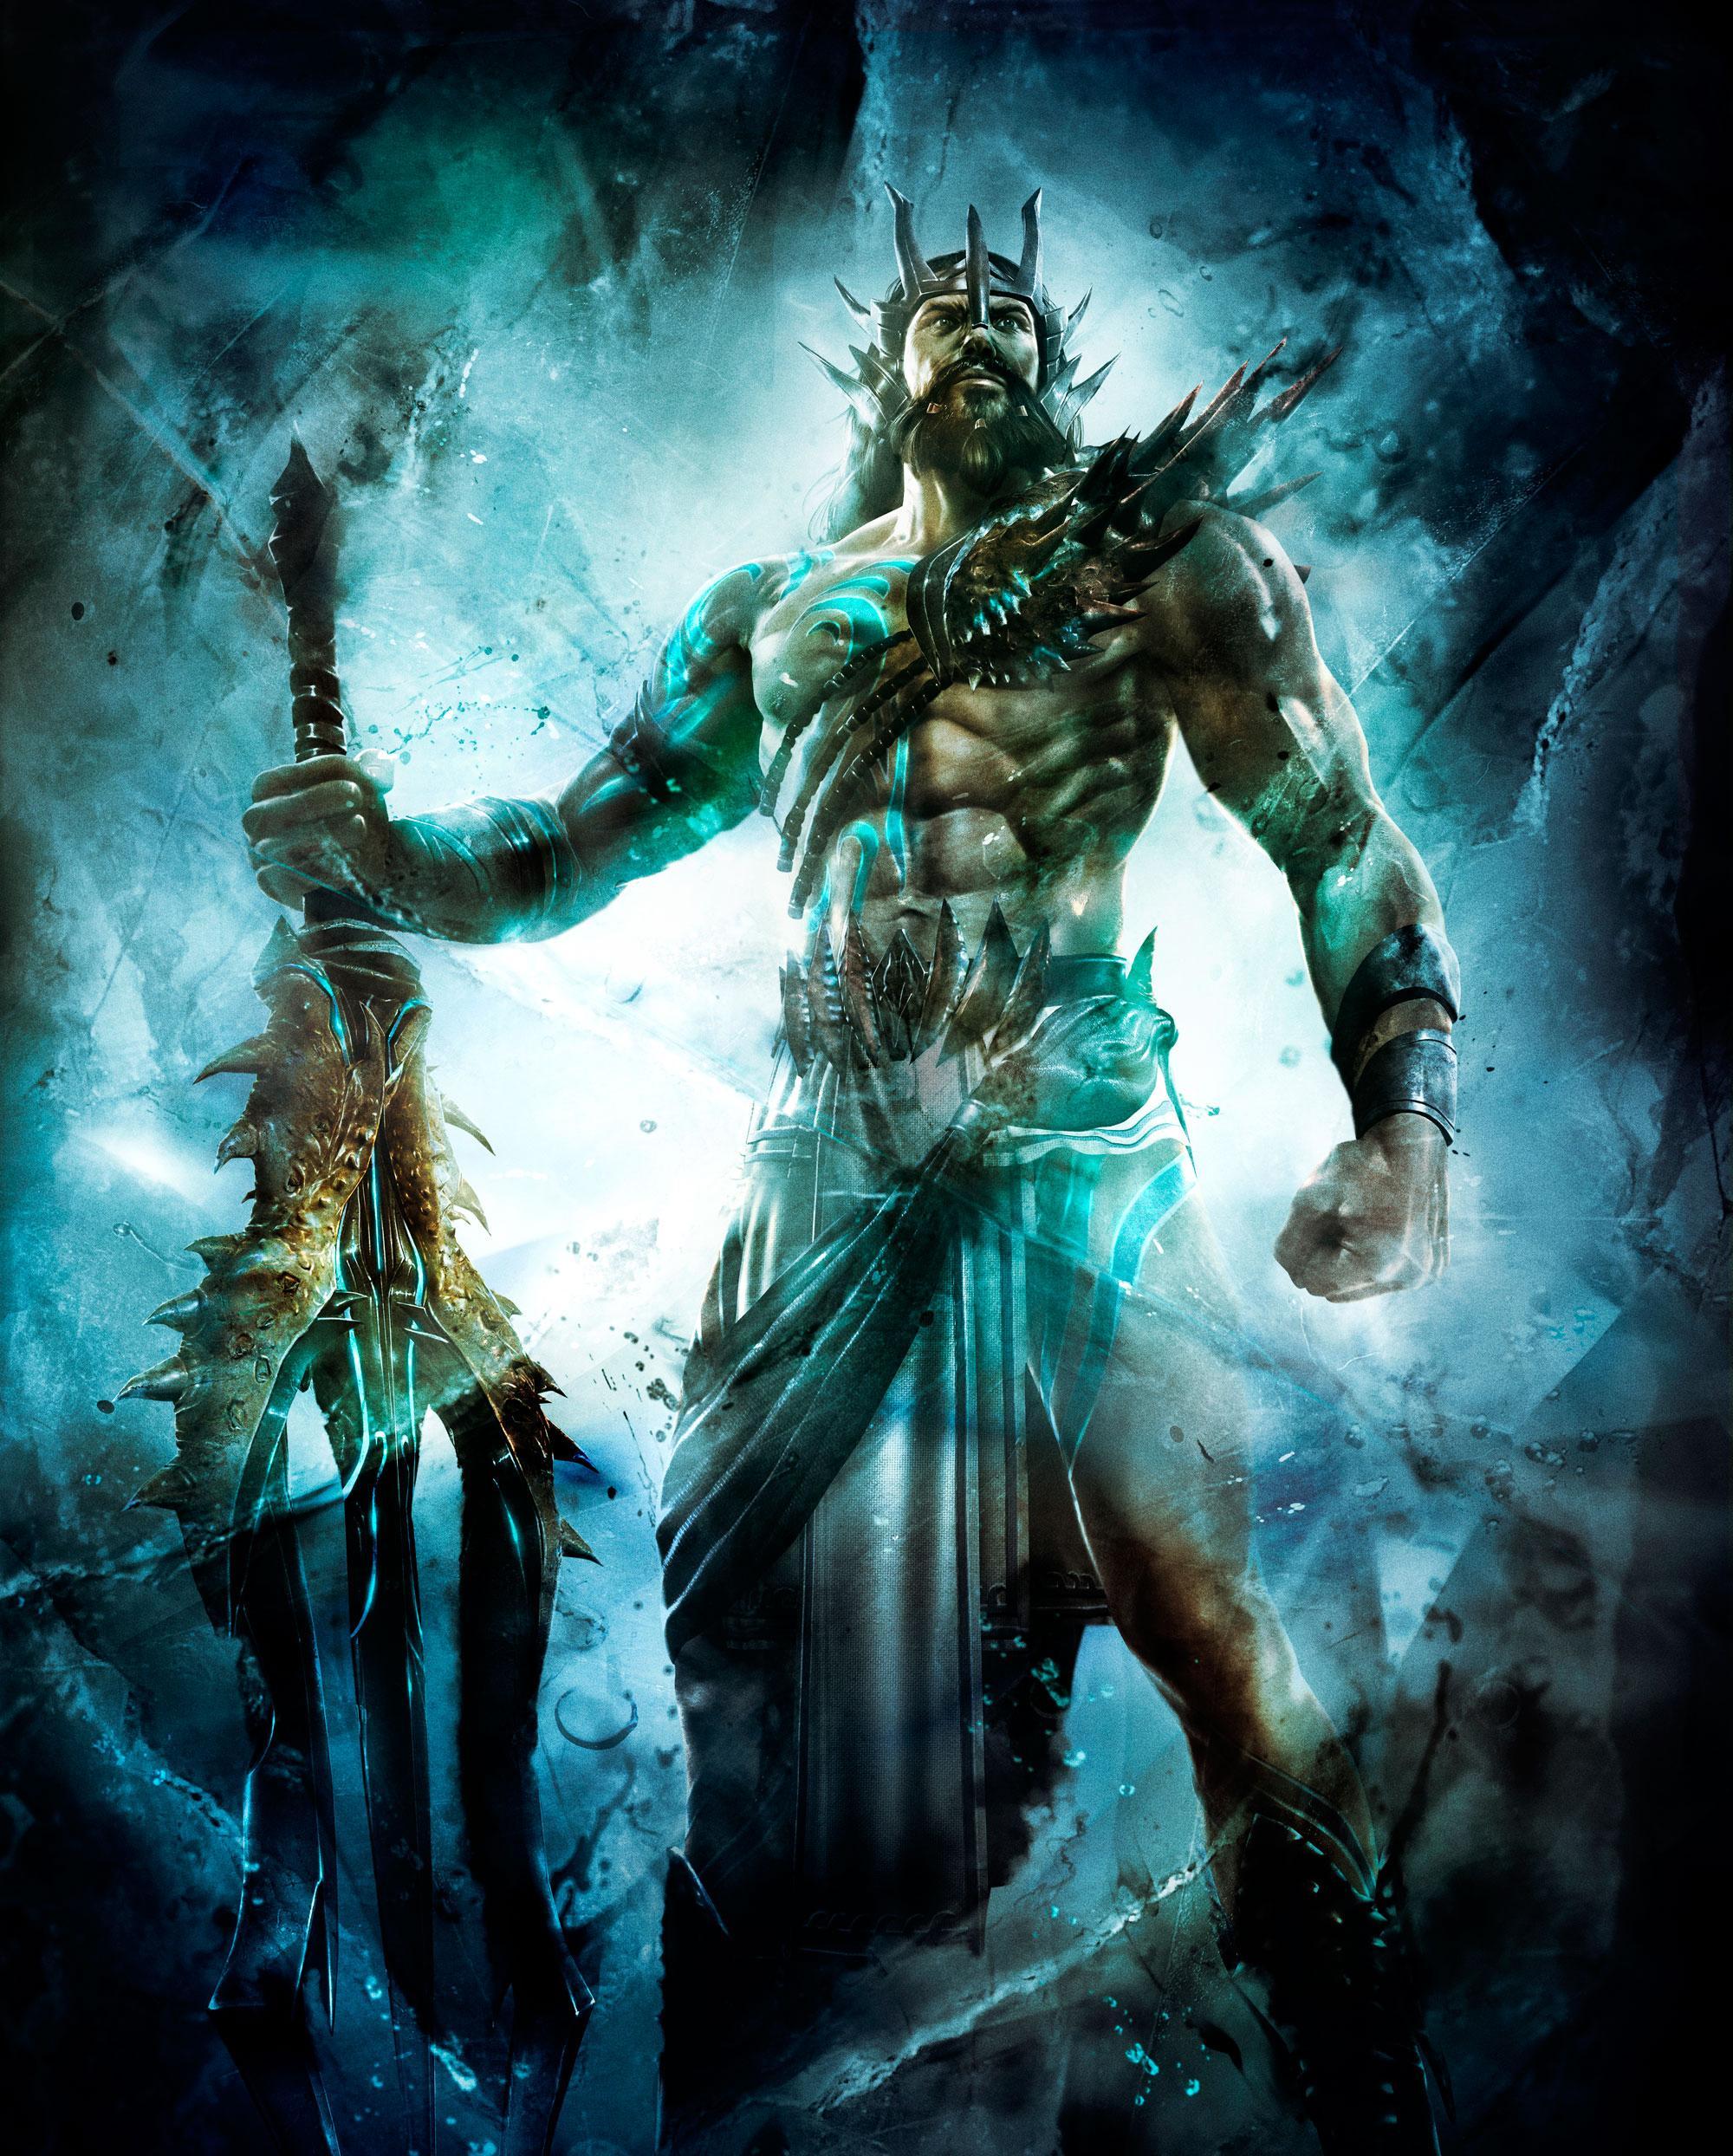 Poseidon | PlayStation All-Stars Wiki | Fandom powered by ...